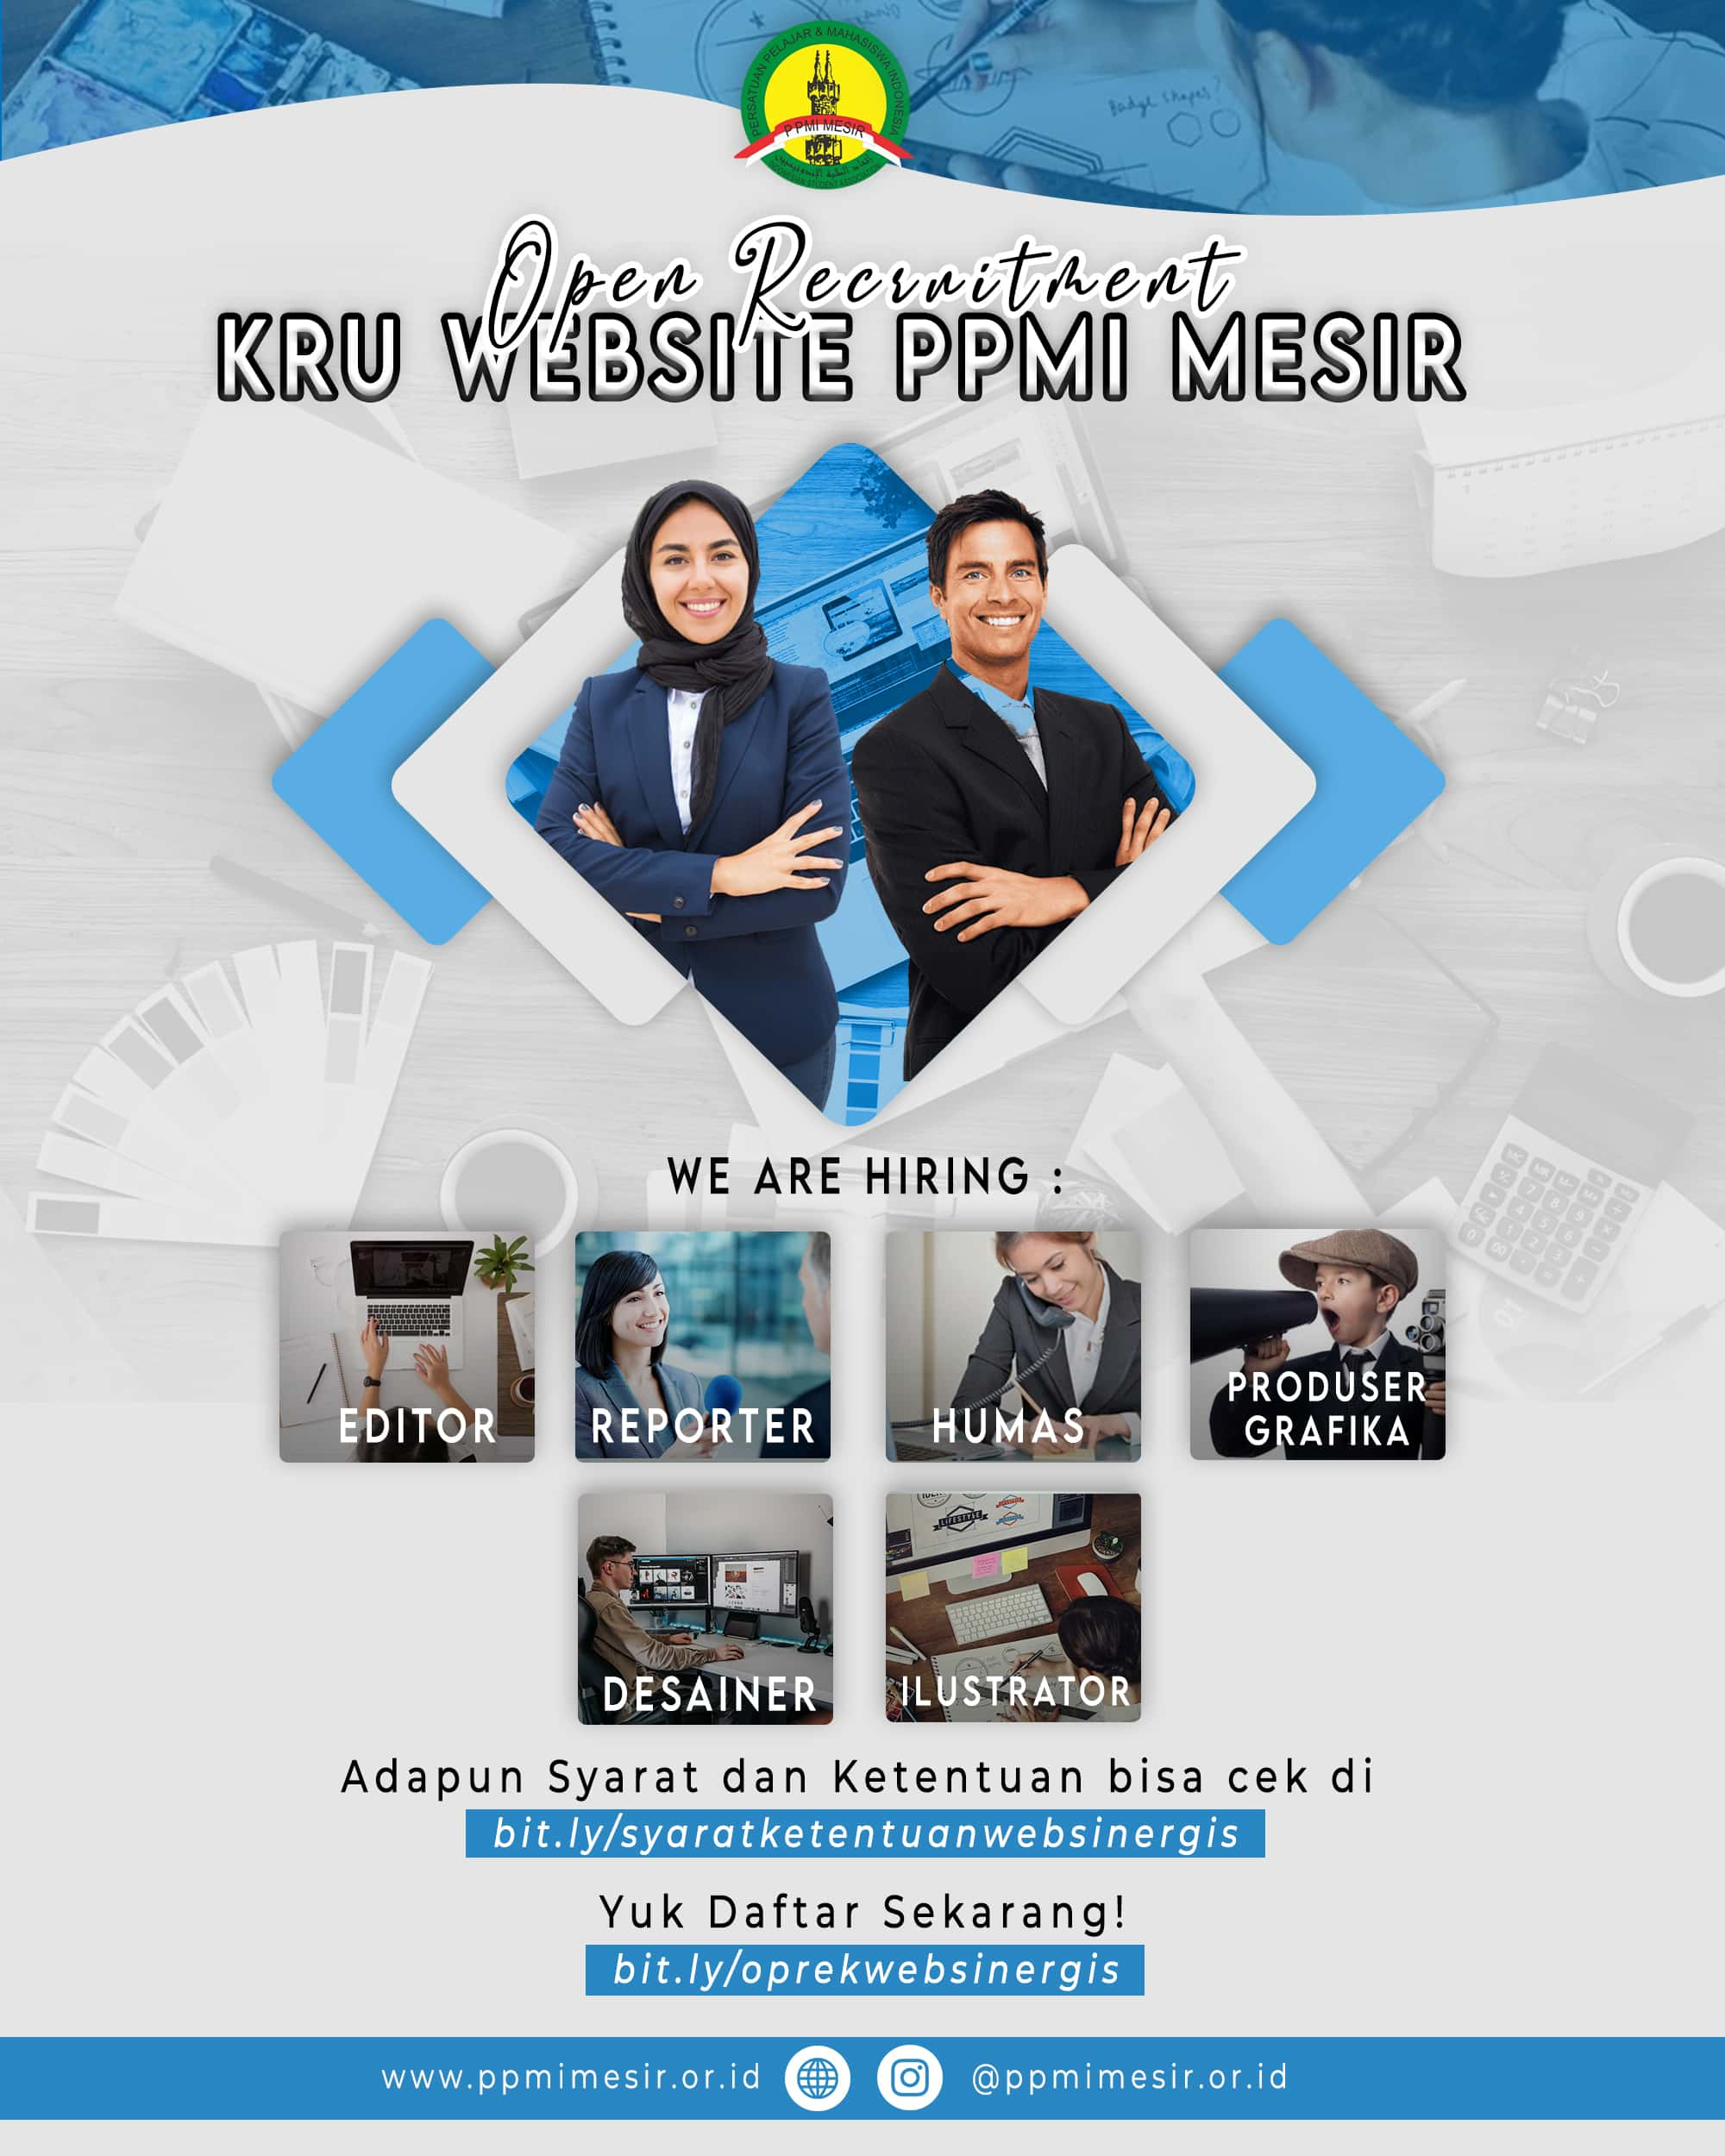 We Are Hiring!, Mari Bergabung Bersama Kami di Kru Website PPMI Mesir